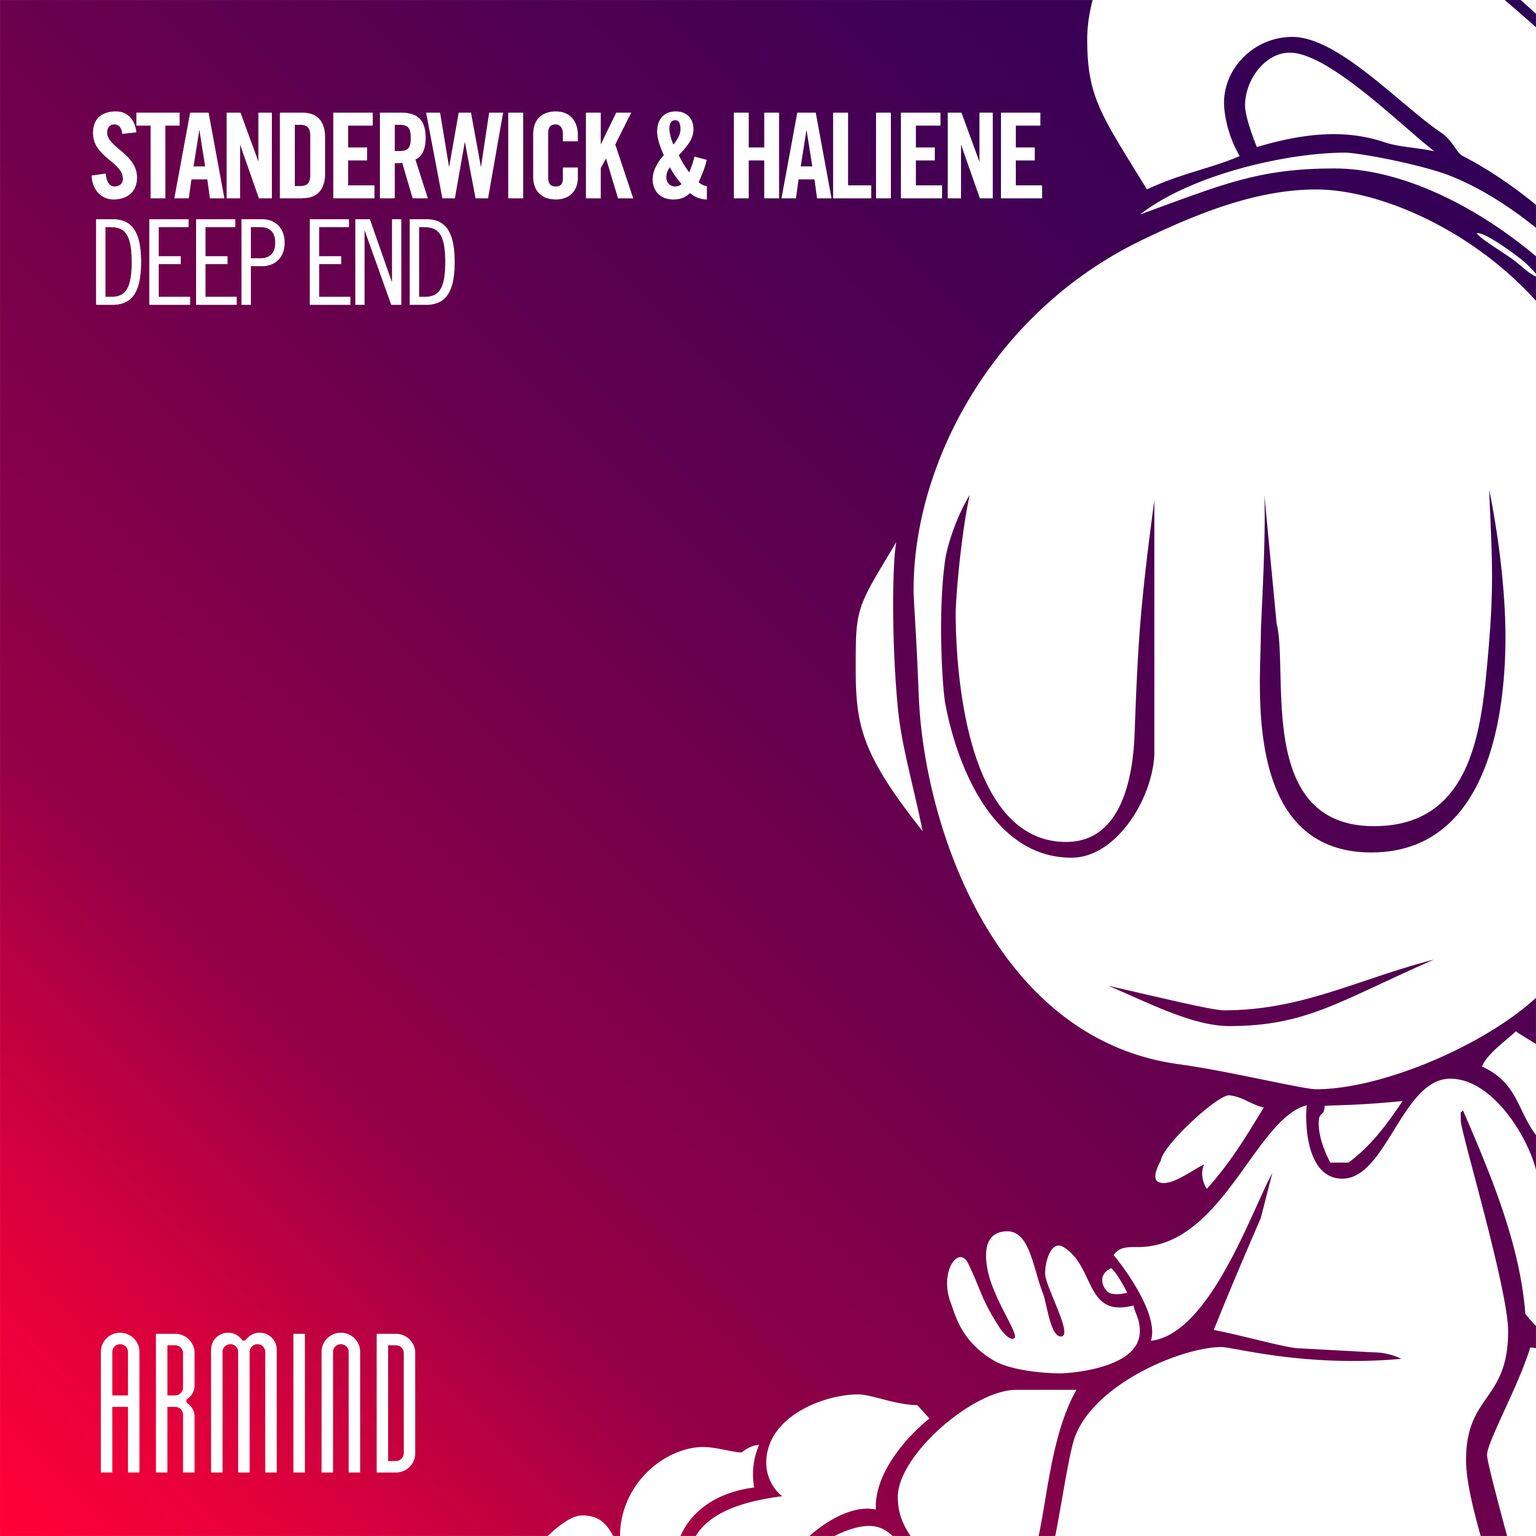 Standerwick & Haliene - Deep End